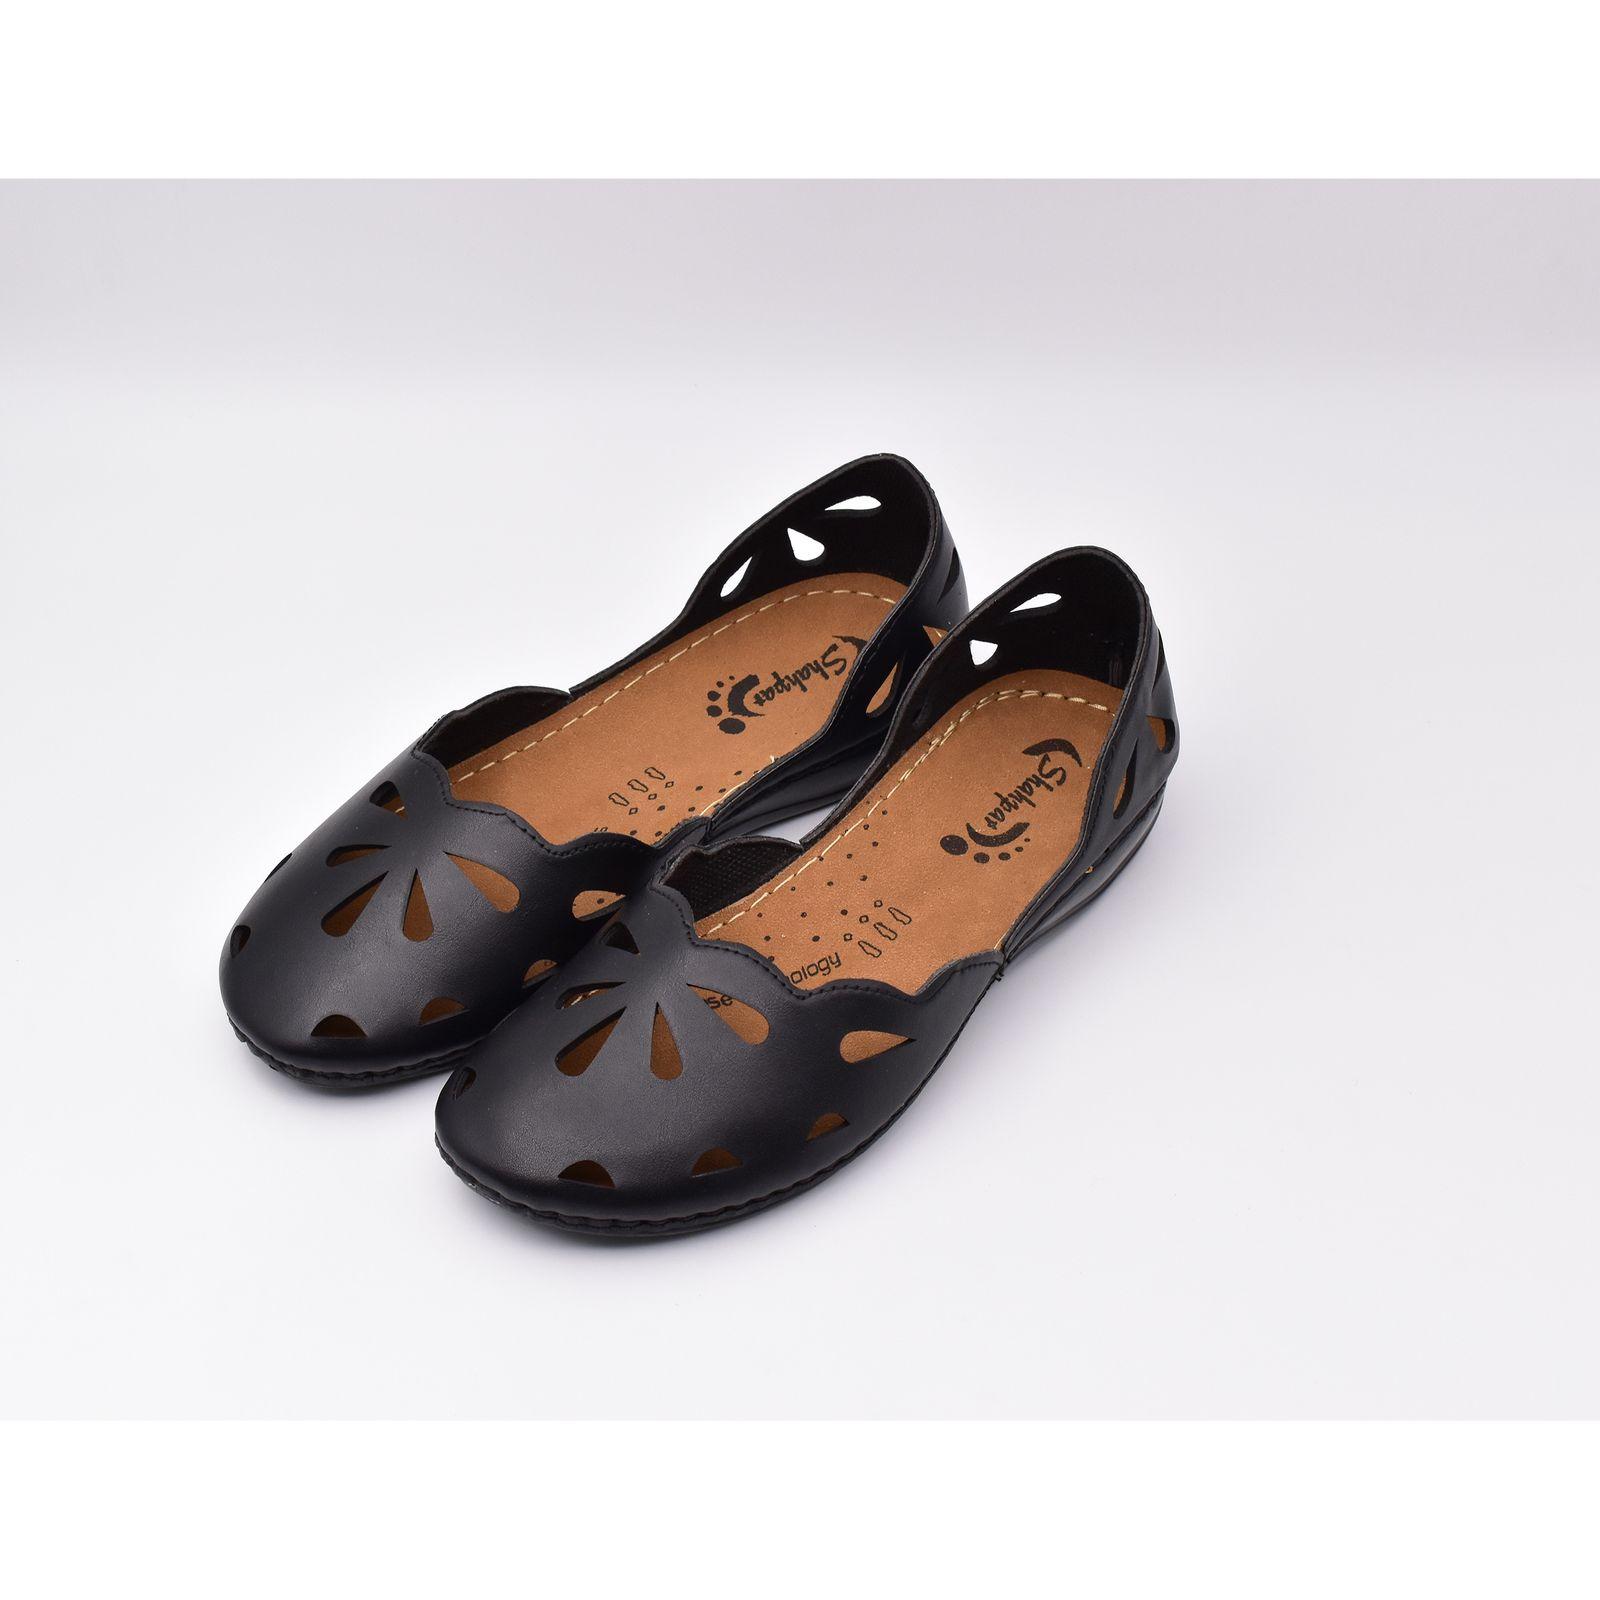 کفش زنانه شهپر مدل رویا 109 کد 7187 -  - 6